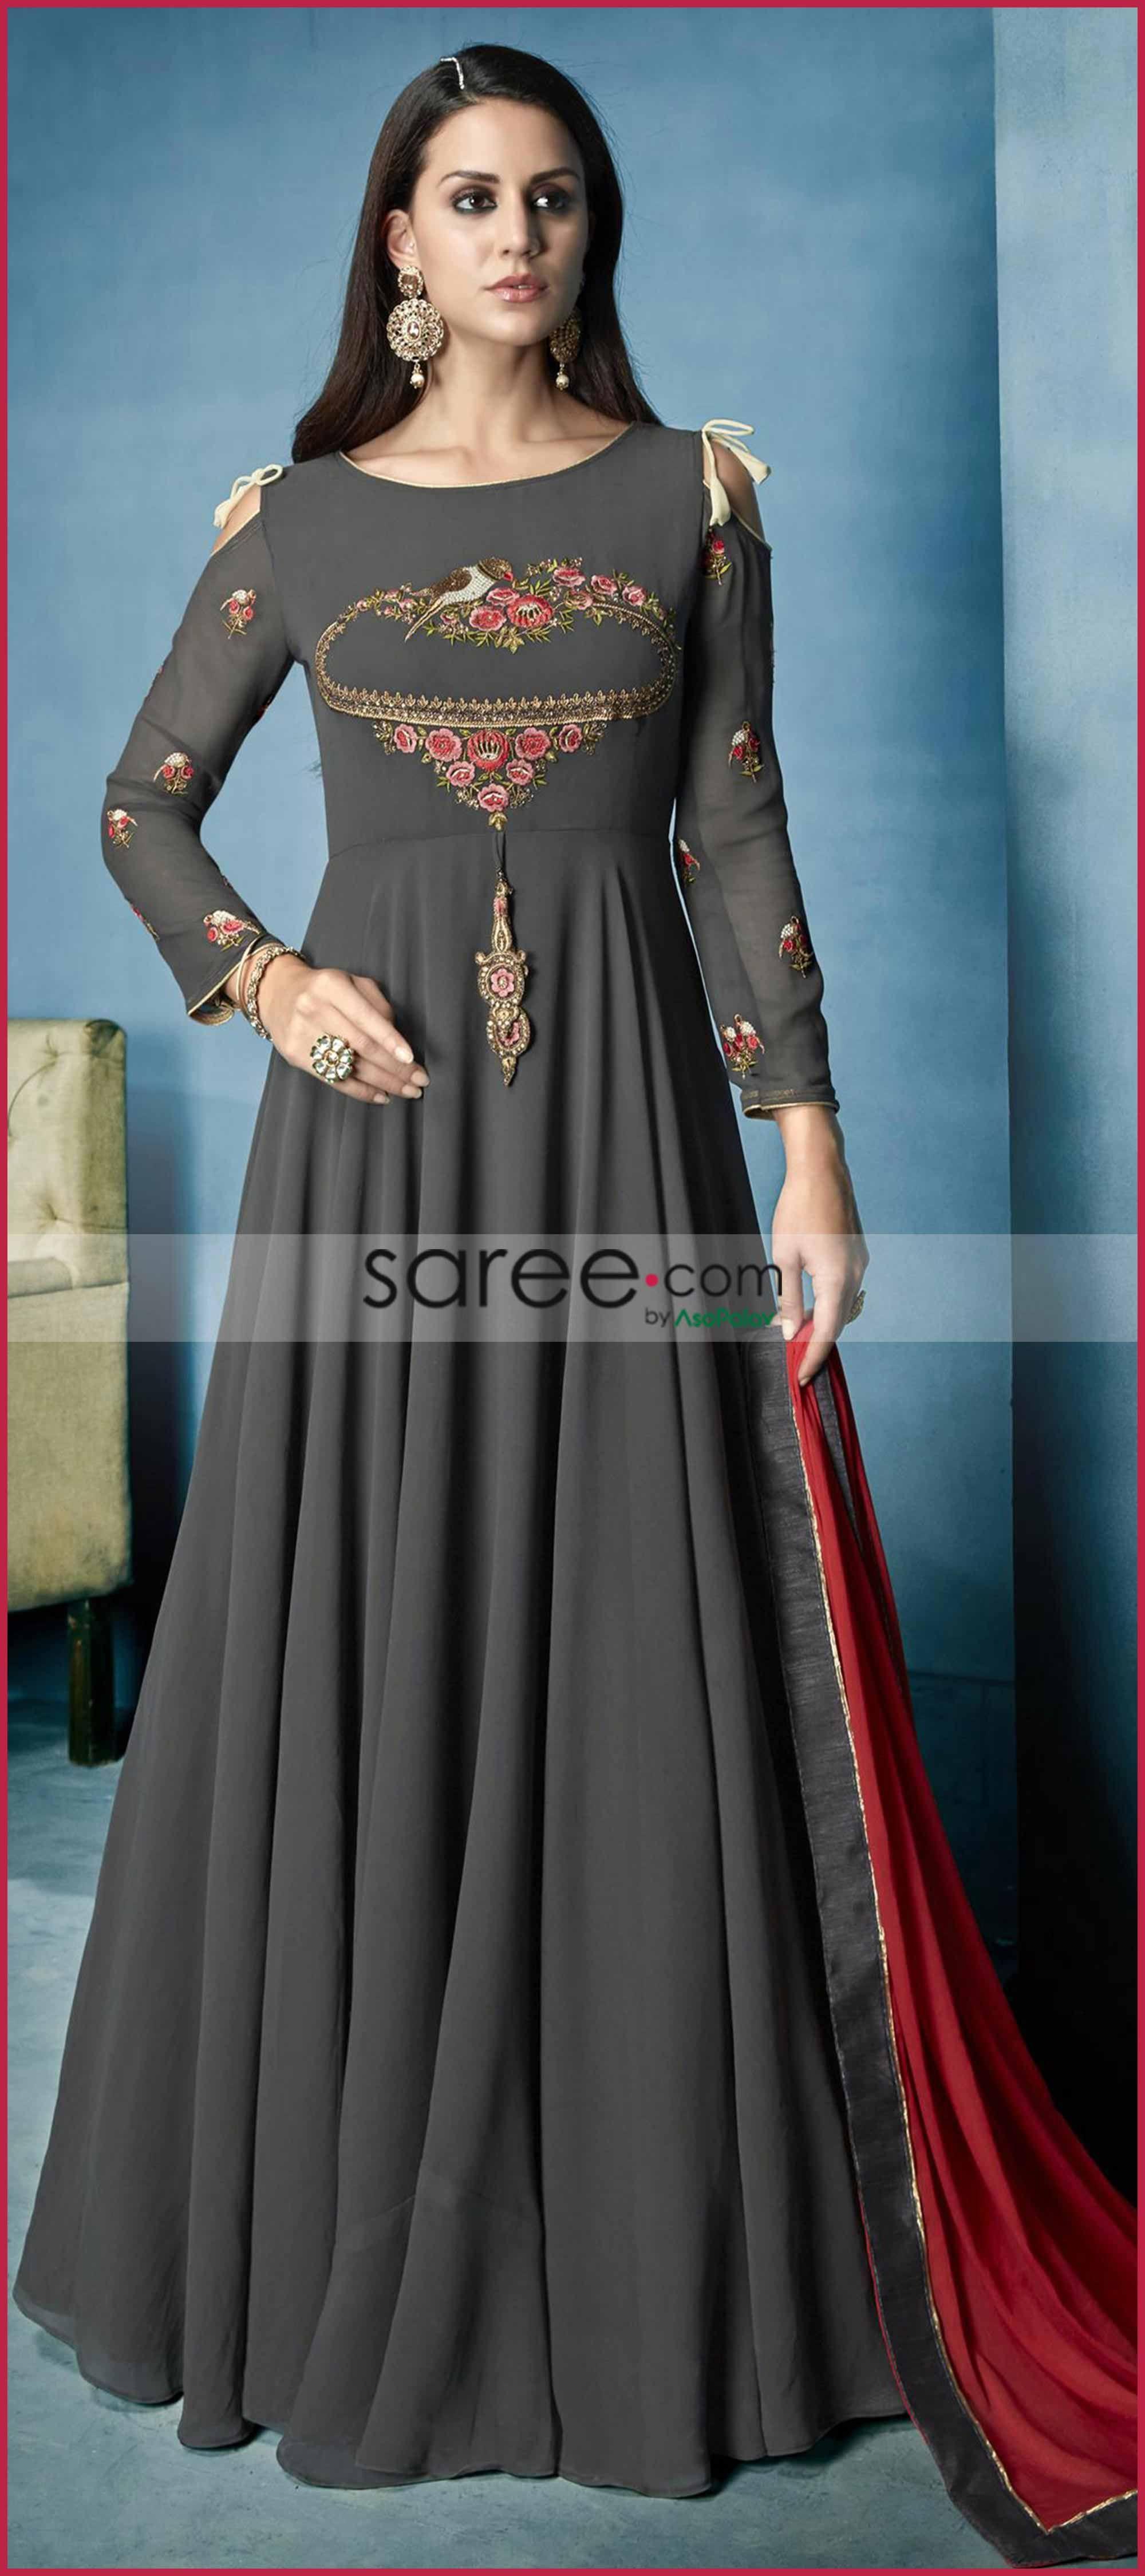 851b50336ffc0 Grey Georgette Designer Cold Shoulder Anarkali Suit with Thread Embroidery